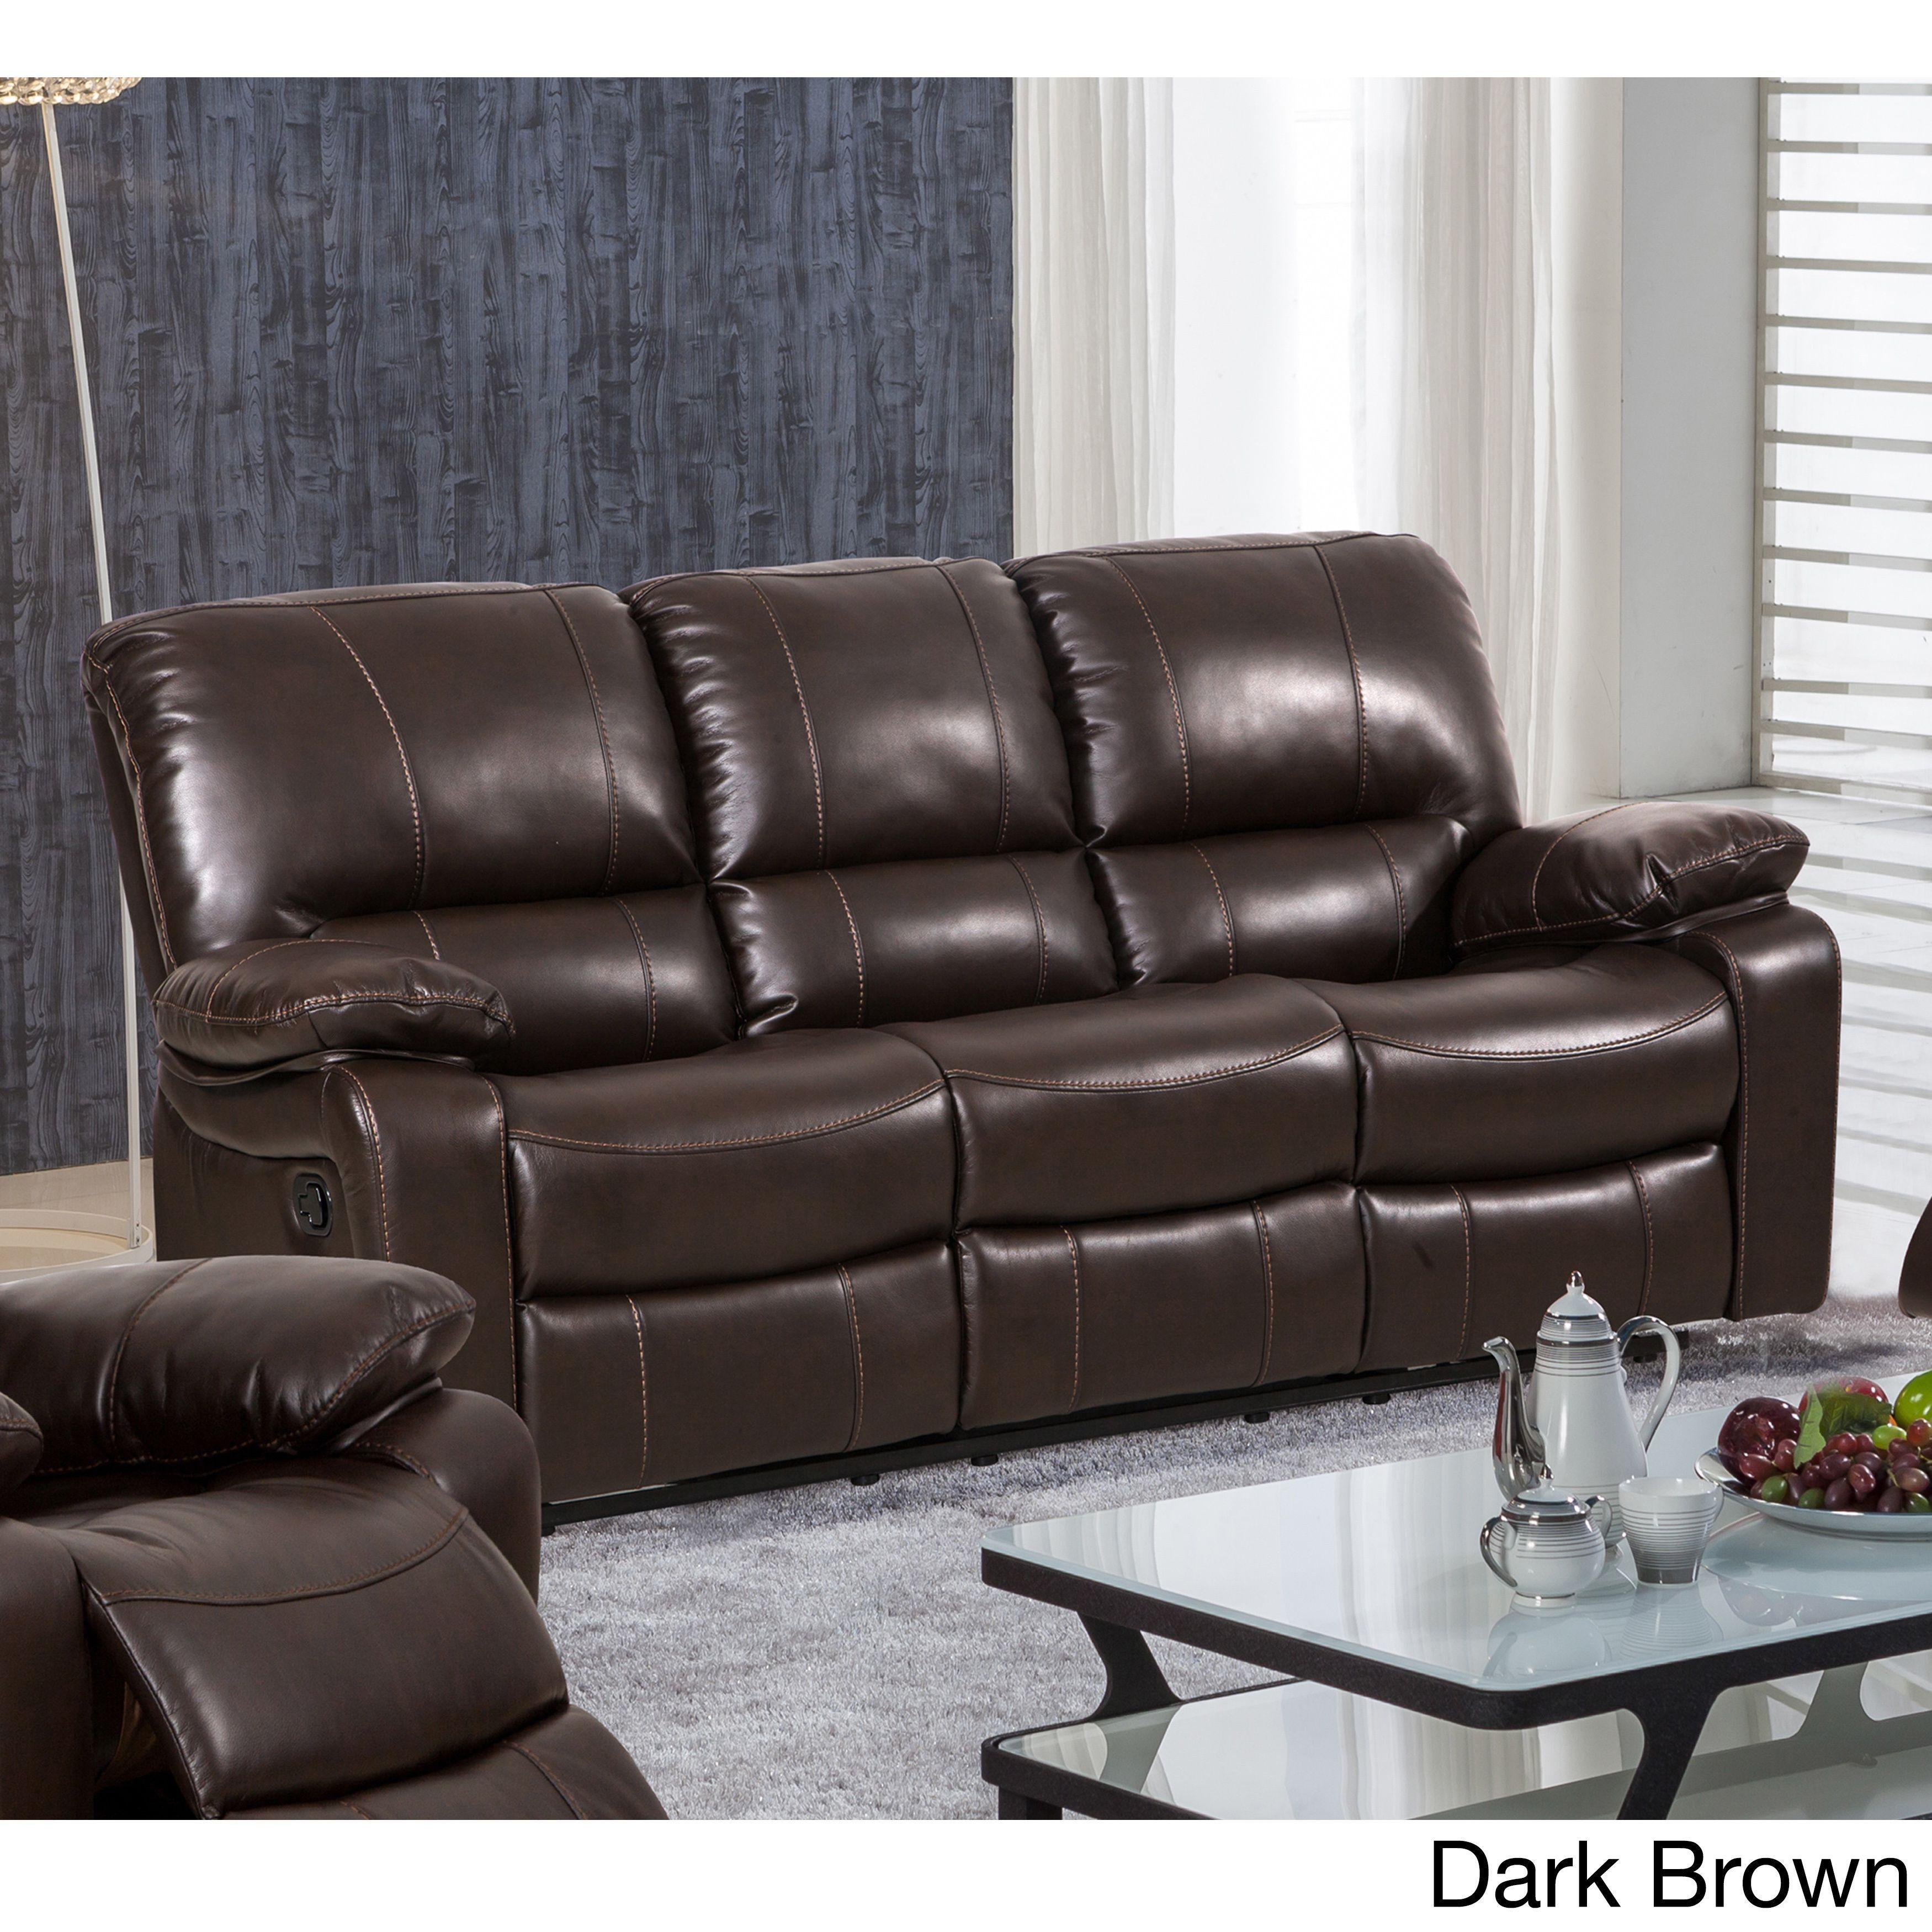 2678CS Reclining Leather Sofa by HTL SKU 3S2XA